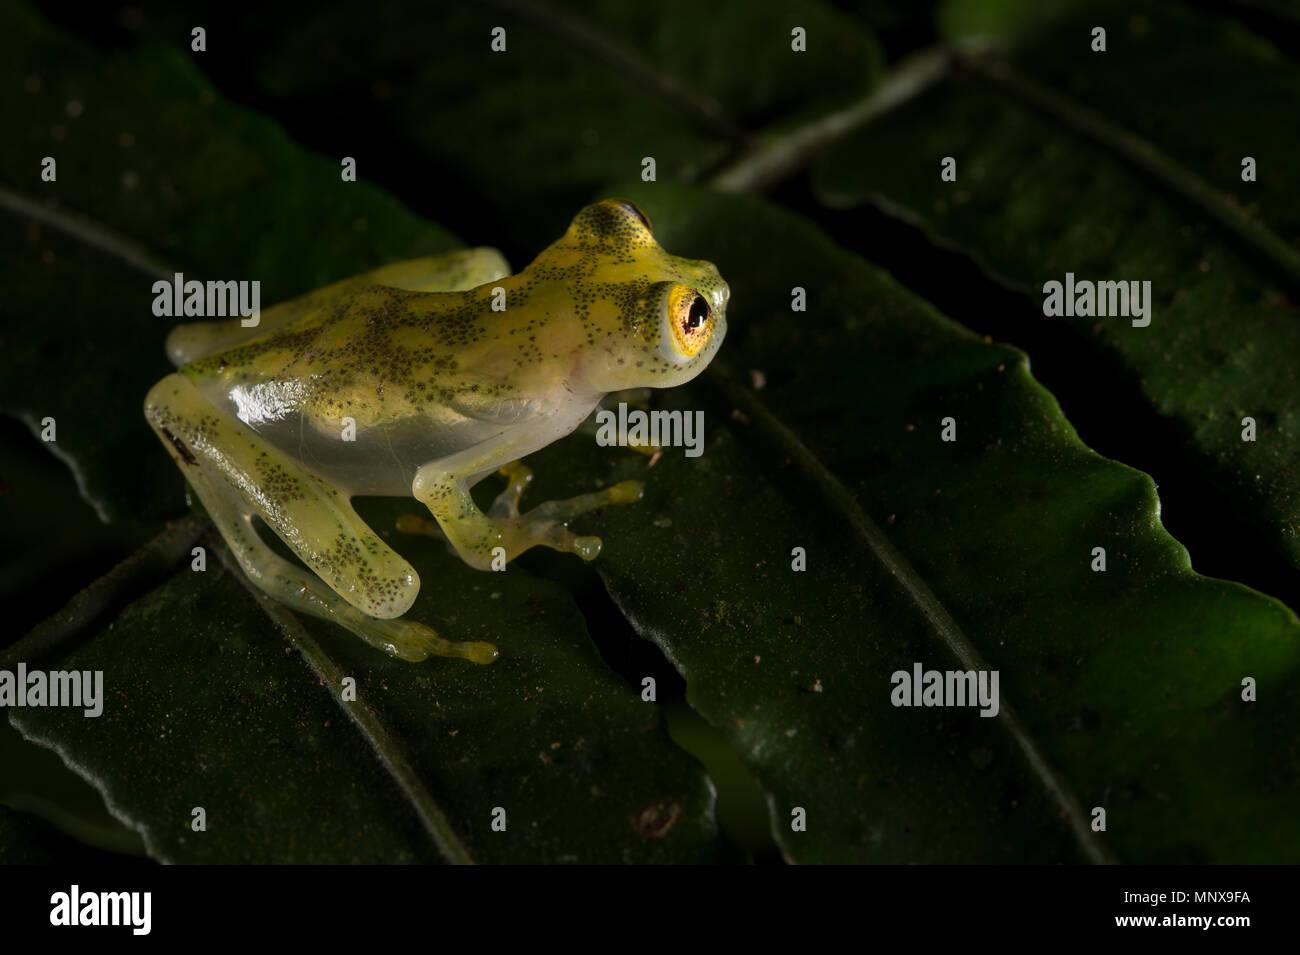 Grenouille de verre réticulée, Hyalinobatrachium valerioi, Centrolenidae, Costa Rica Banque D'Images